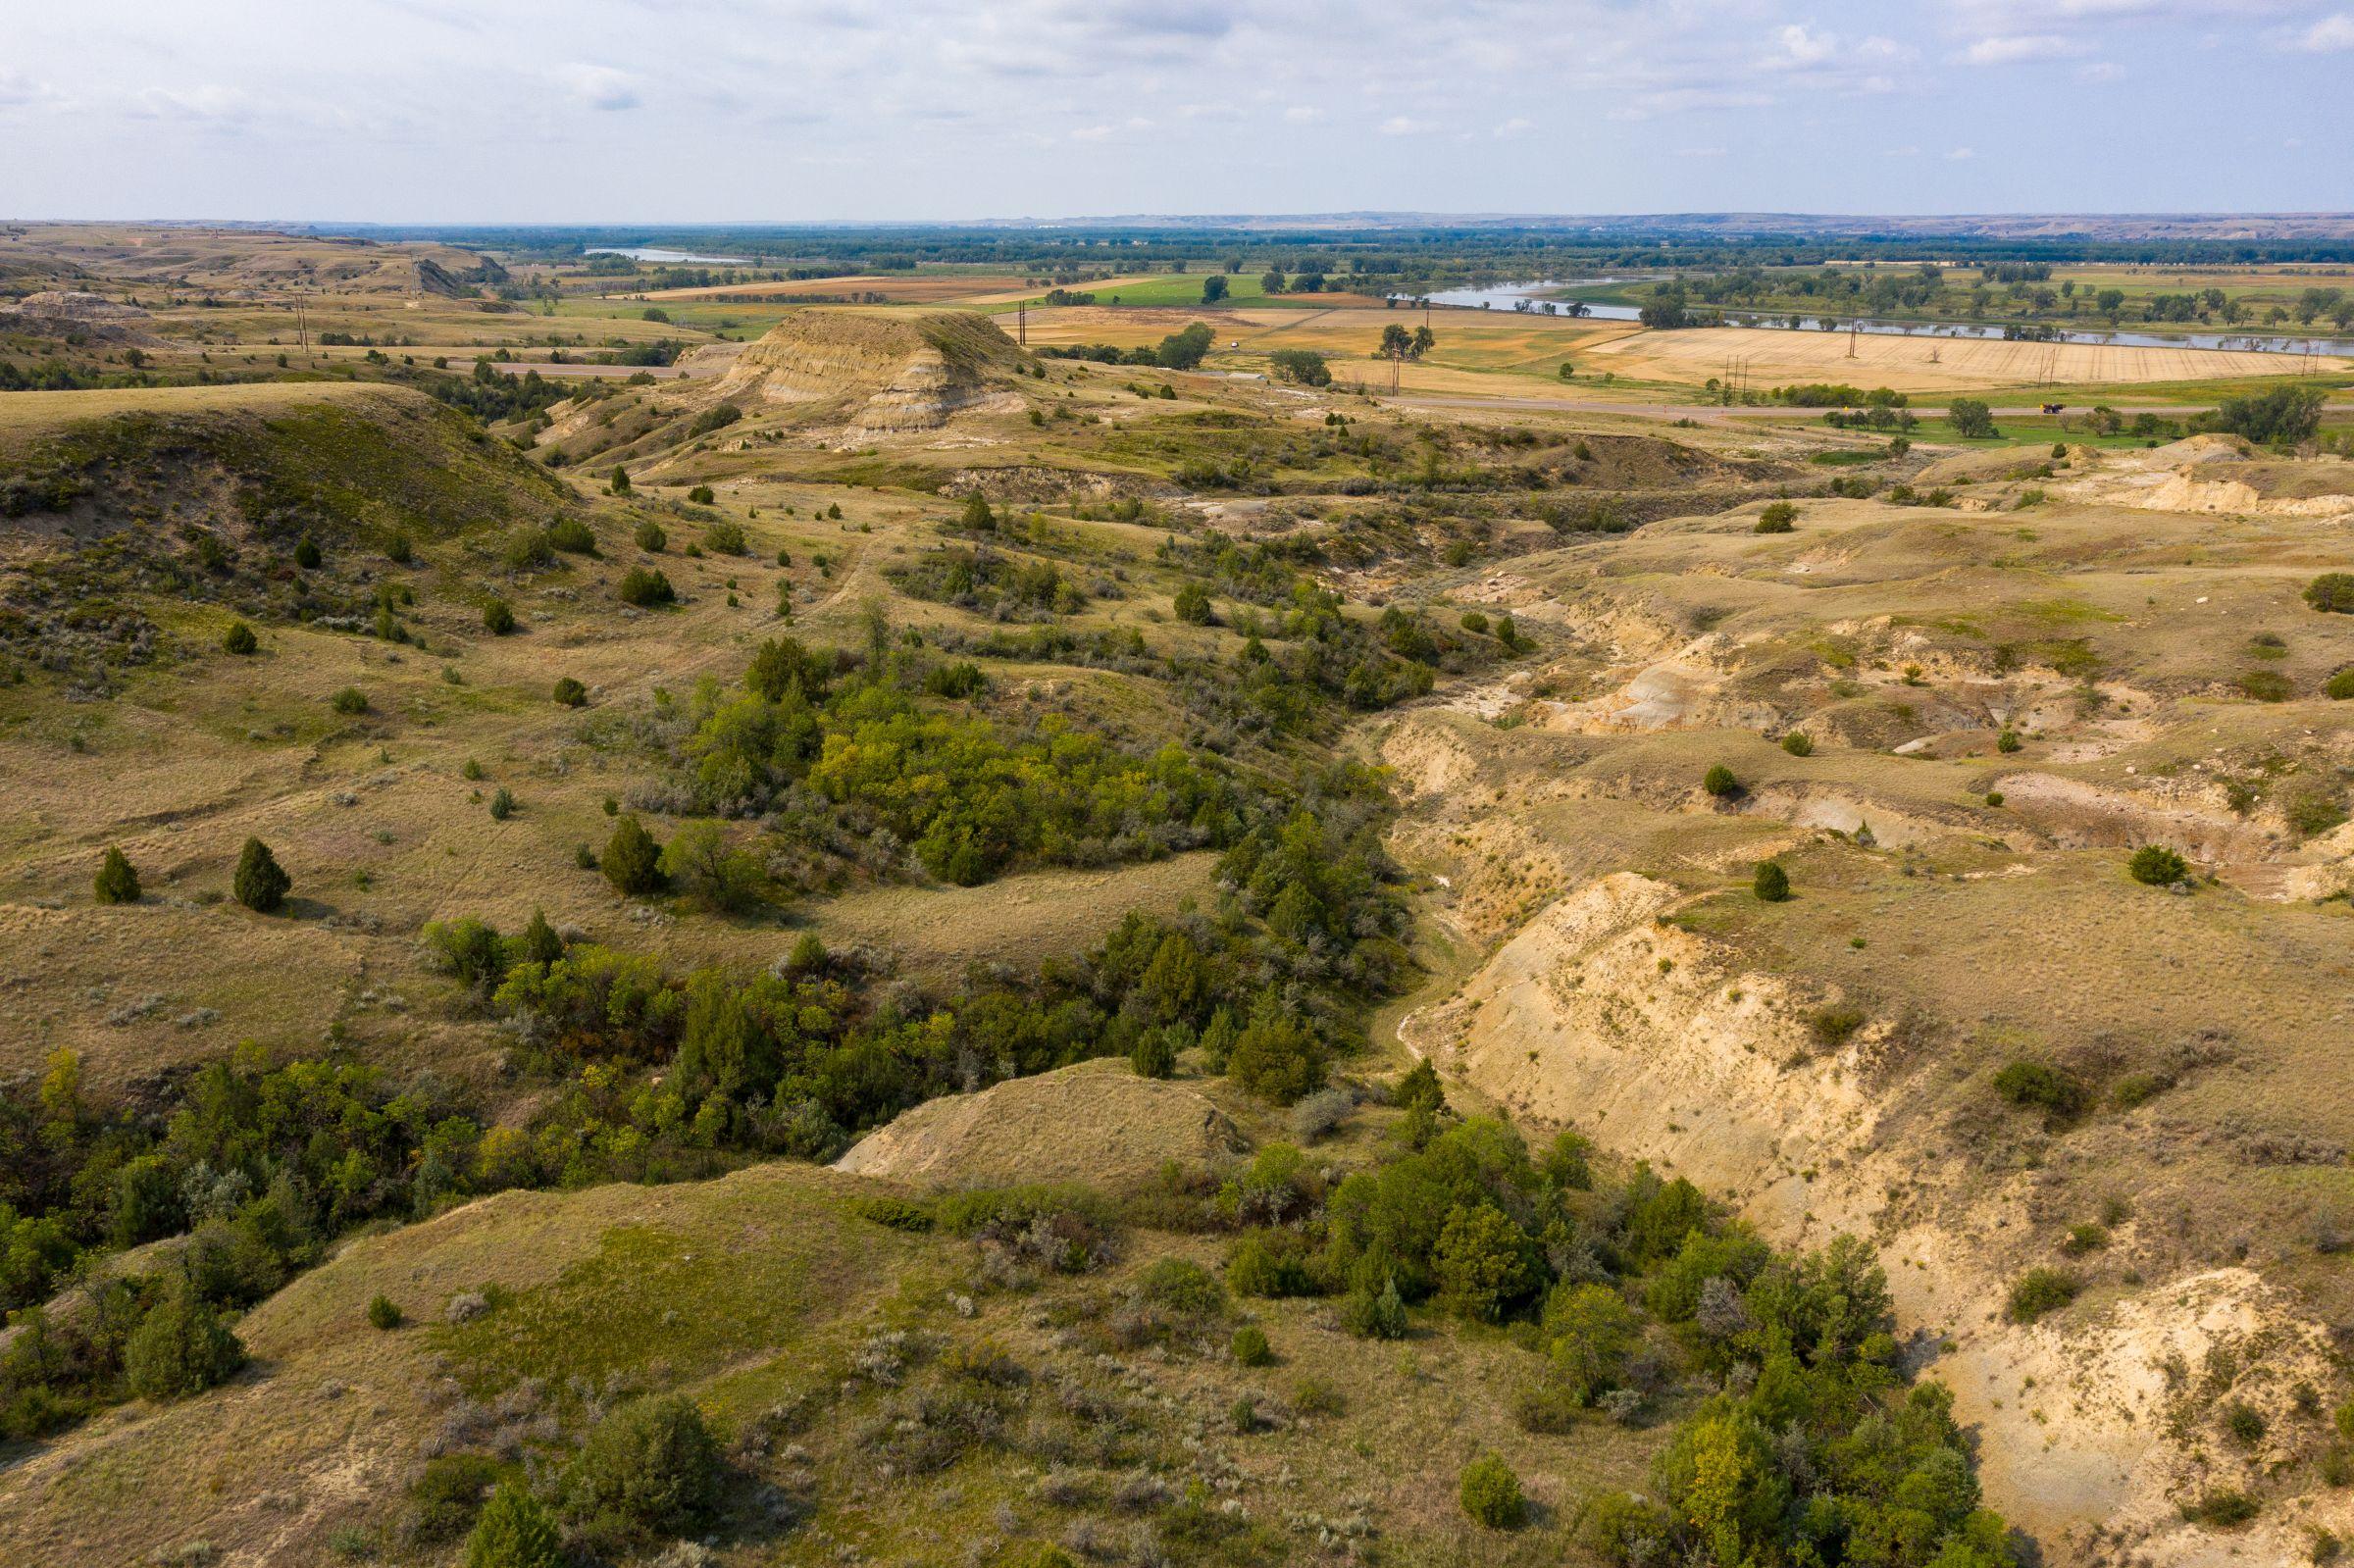 auctions-land-mckenzie-county-north-dakota-270-acres-listing-number-15735-2-2021-09-10-140341.jpeg